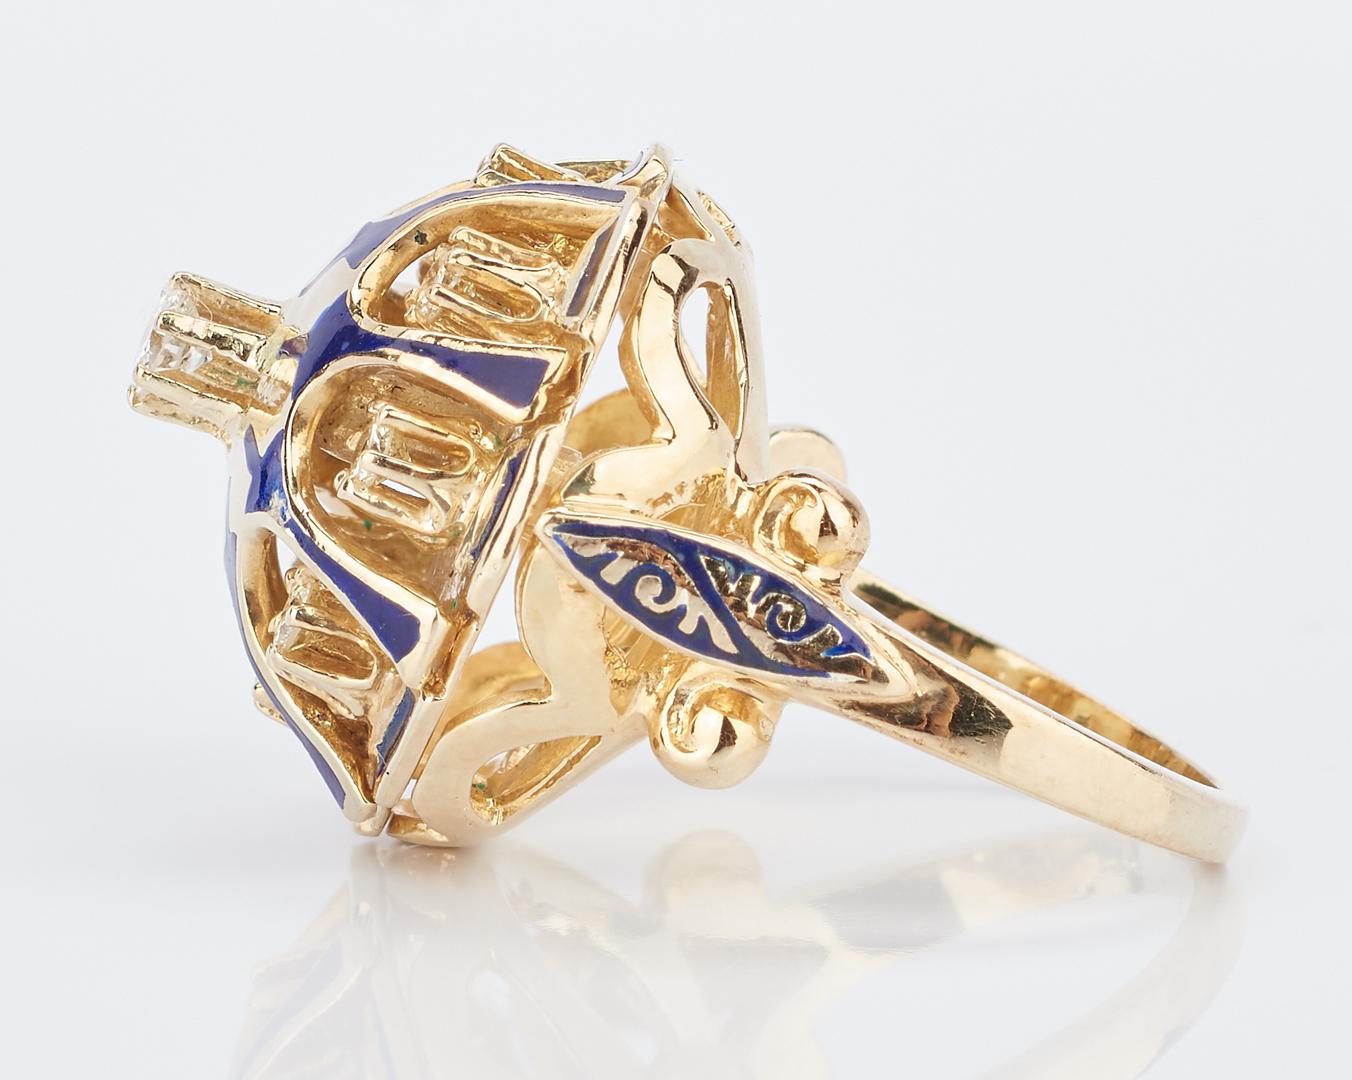 Lot 227: 3 Ladies 14K & Diamond Rings, incl. Ballerina